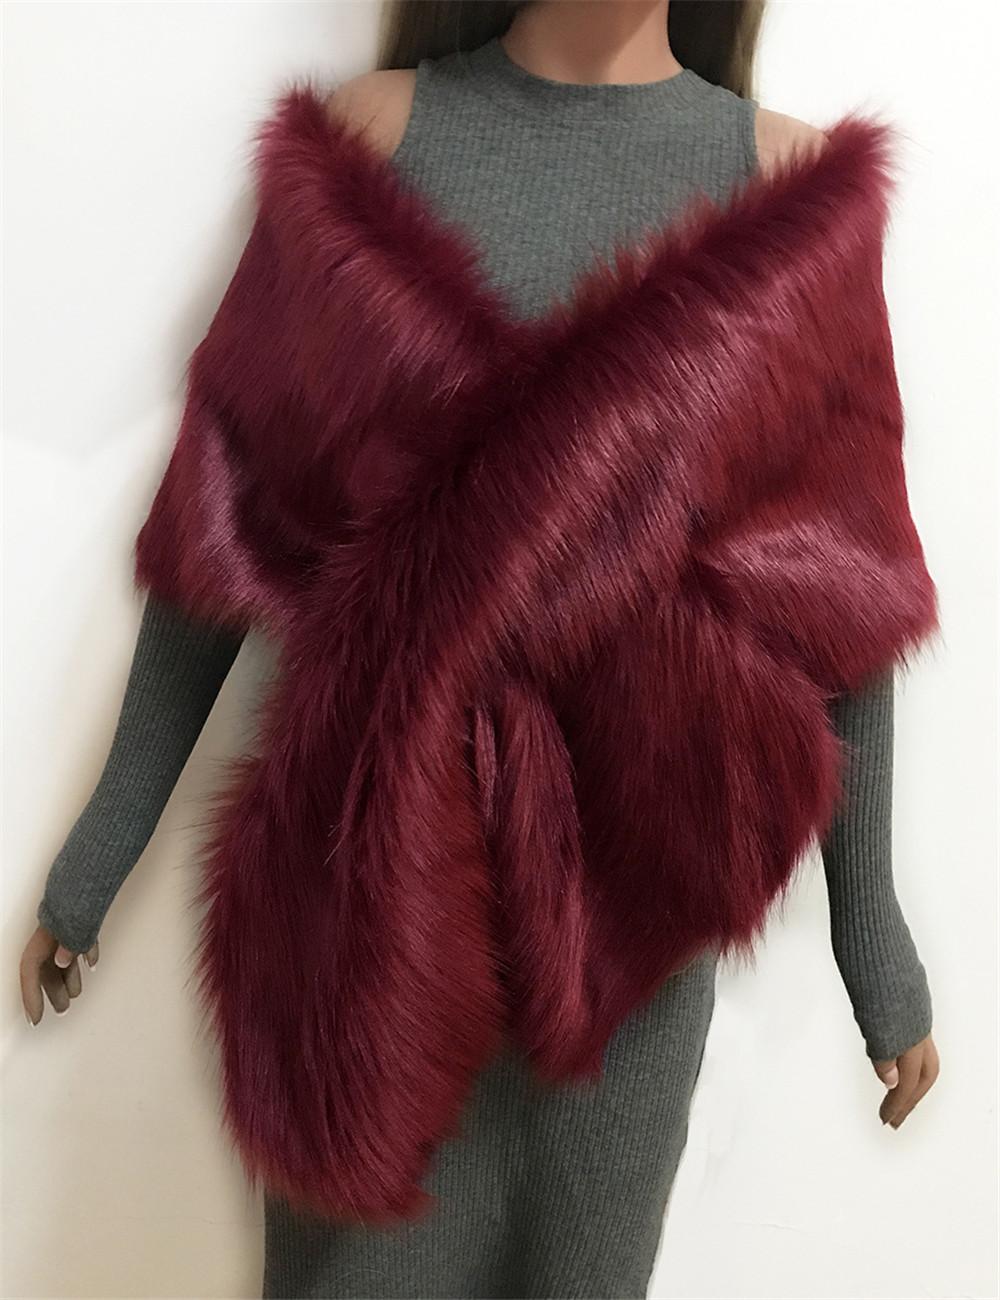 The autumn and winter new imitation fur big cape neck scarf multi-color joker scarf bride dress cross cape (7)